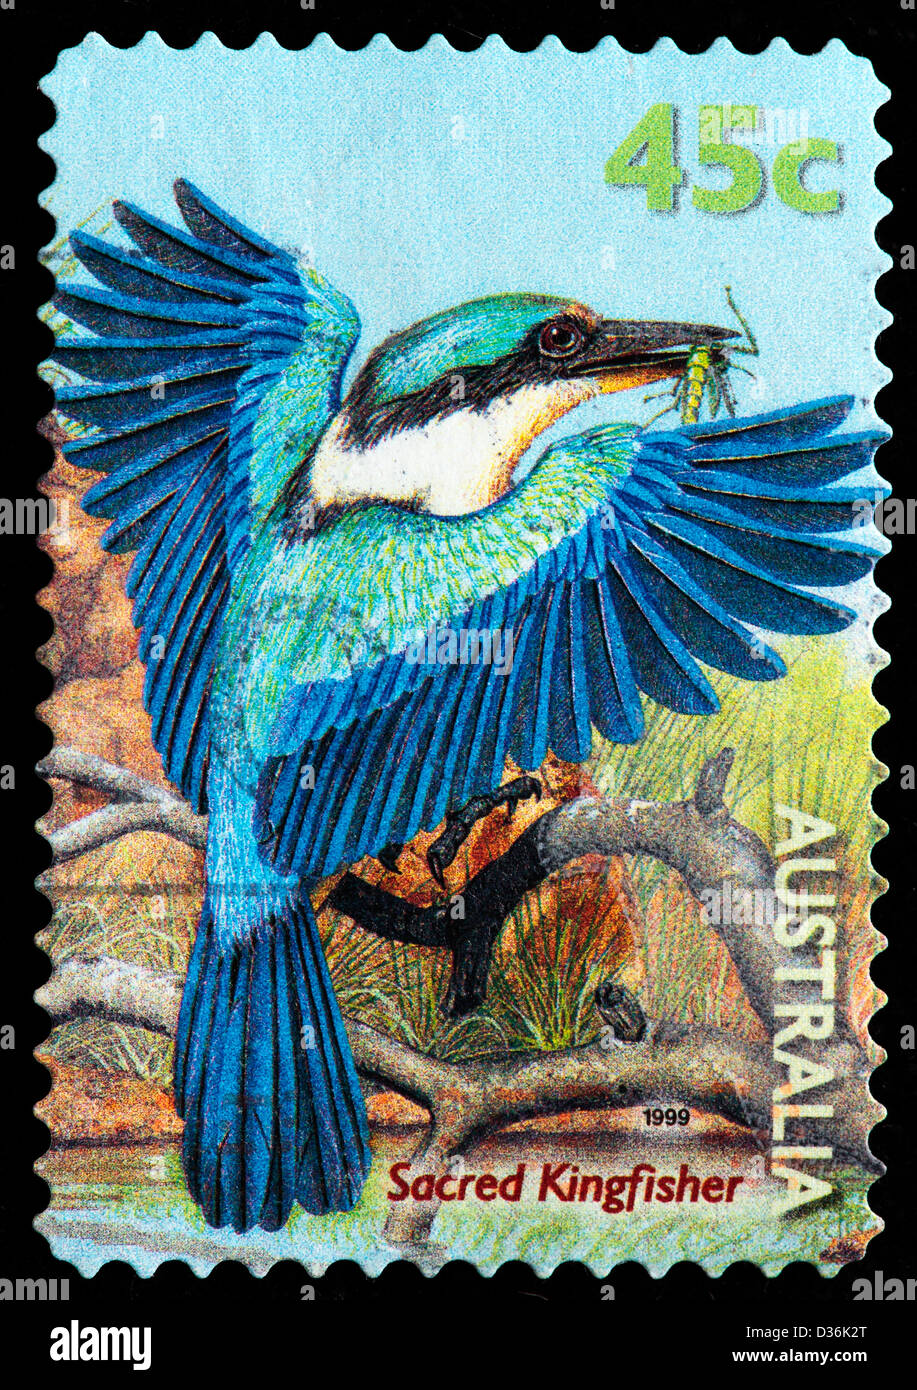 Sacred Kingfisher bird, postage stamp, Australia, 1999 - Stock Image